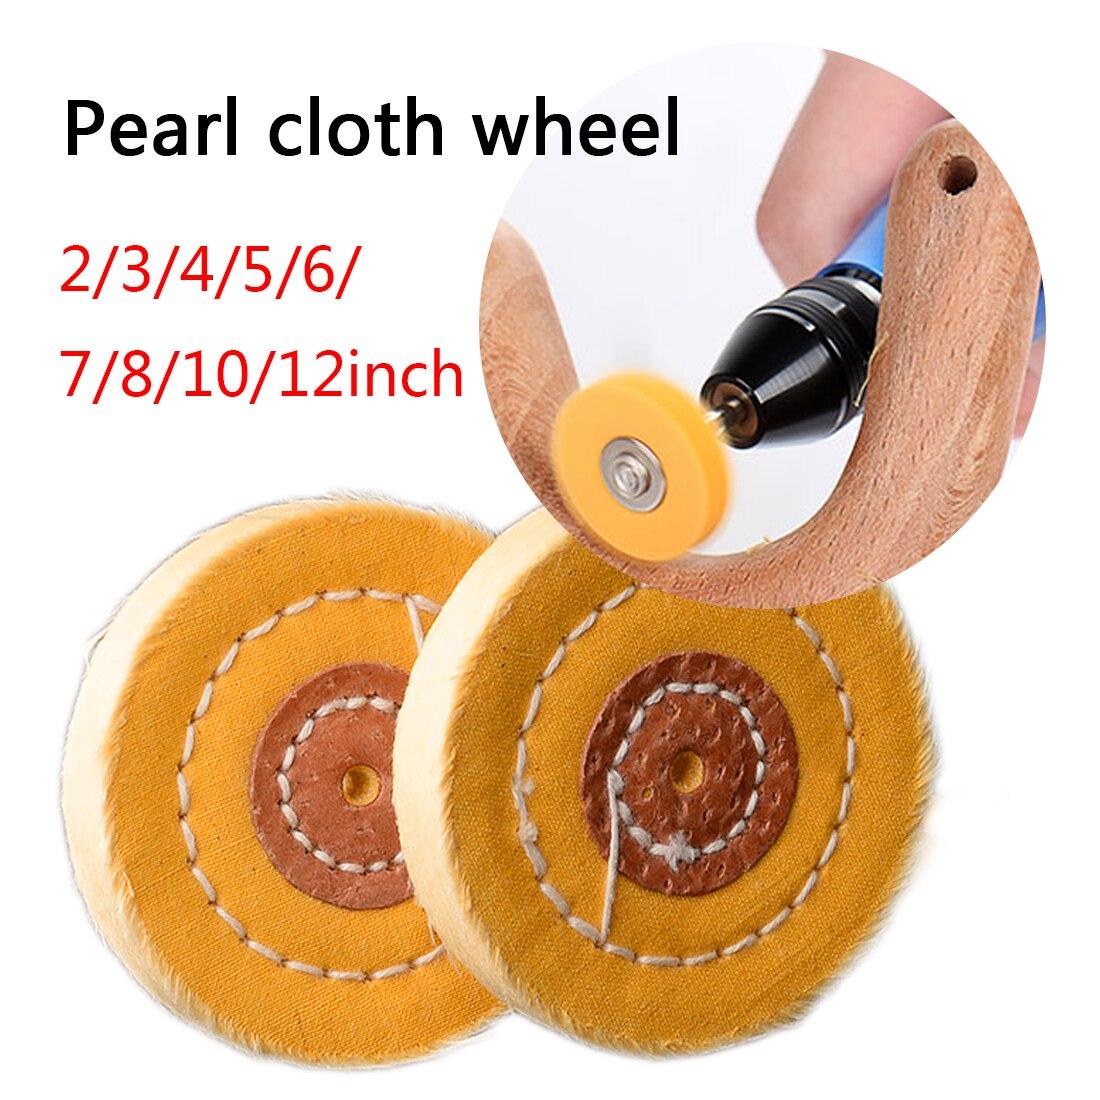 Gold Silver Jewelry  Buffing Wheel Mirror Hardware Polishing Wheel Tool 4mm Inner Diameter 50 Layers 50-300mm Cotton Lint Cloth